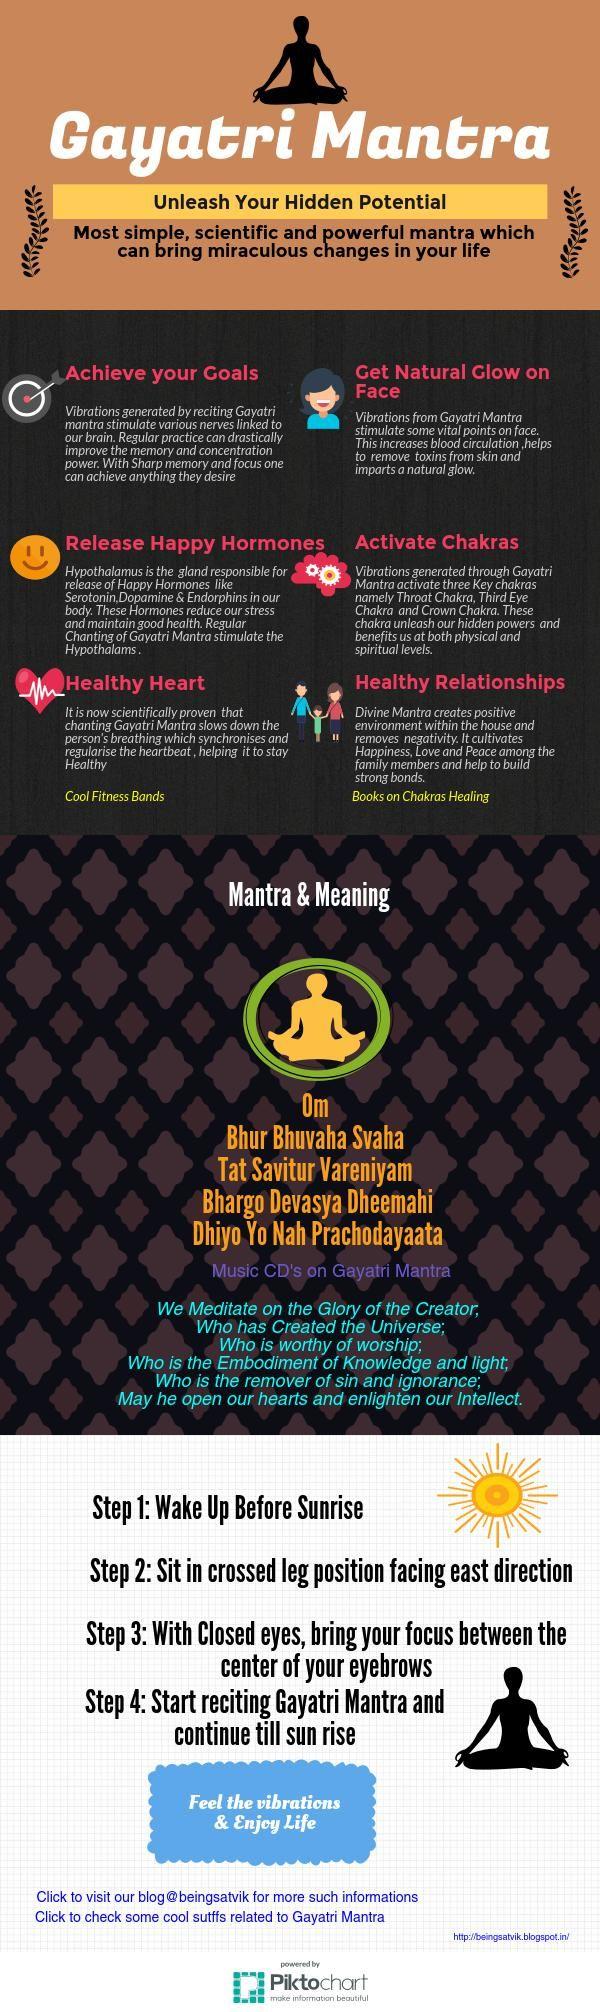 Gayatri Mantra Divine Benefits  | @Piktochart Infographic